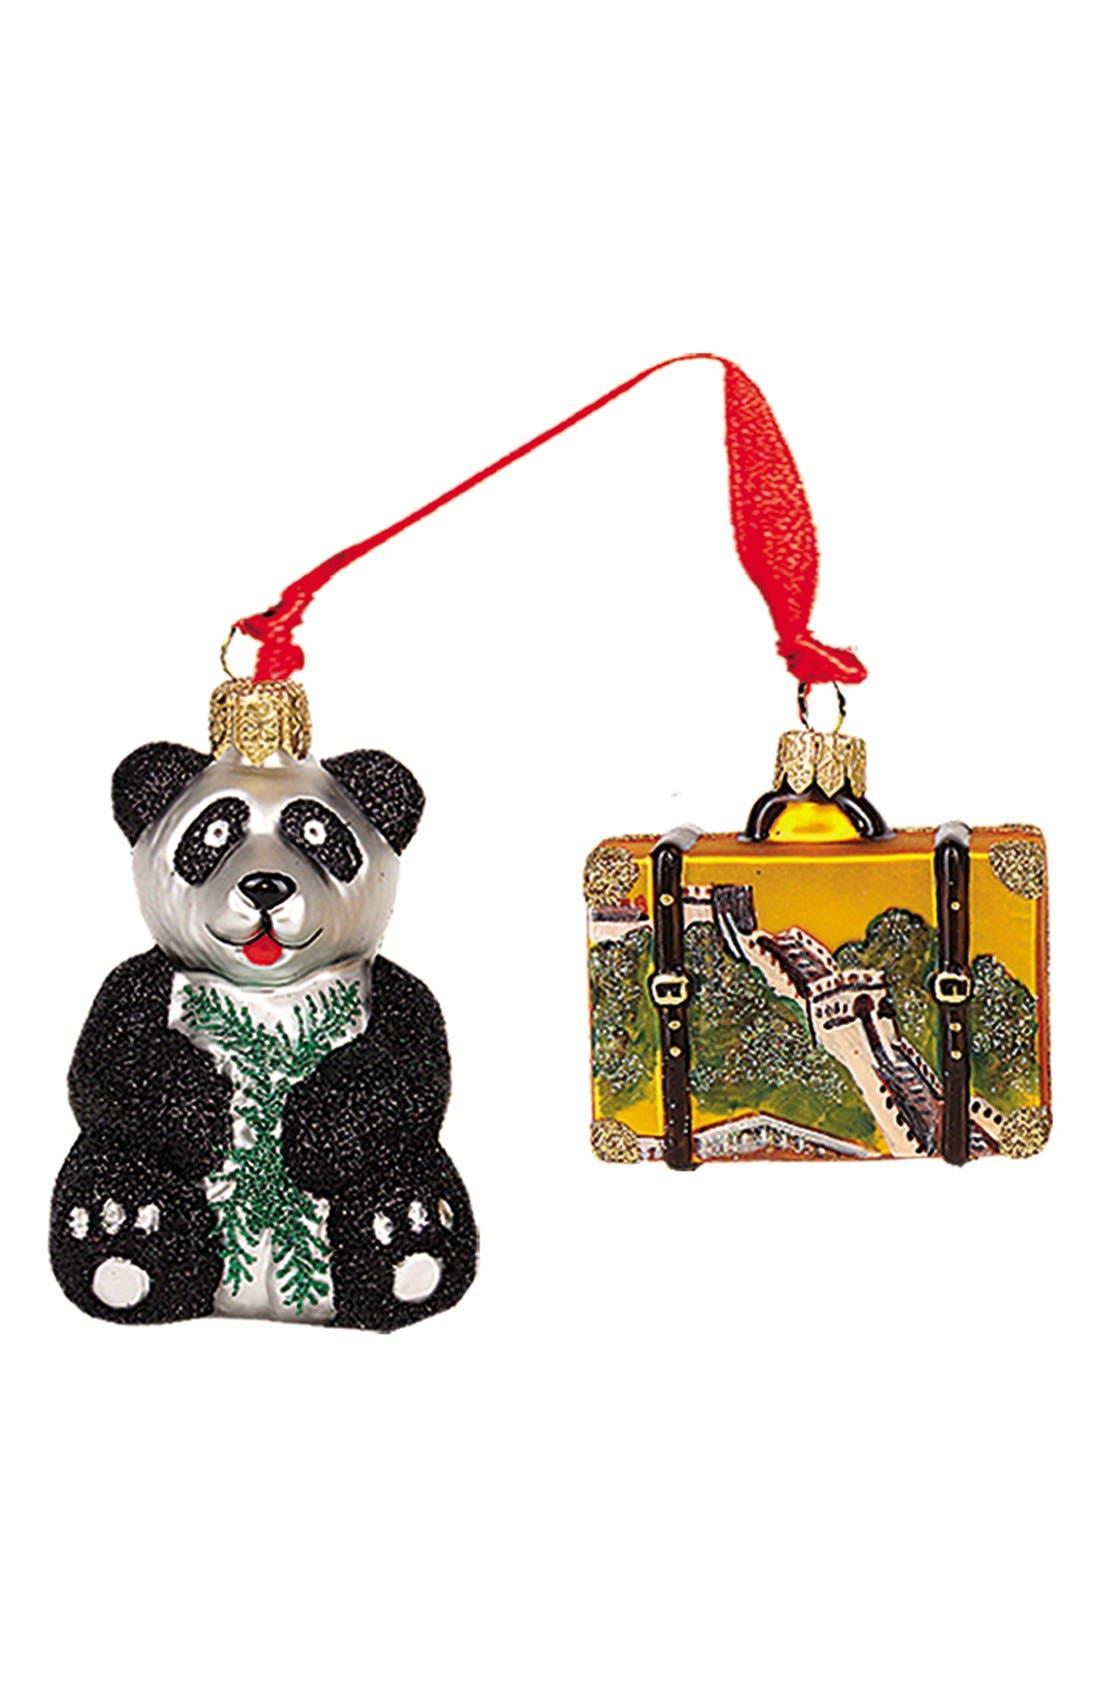 'Travel' Mini Ornament,                         Main,                         color, China With Panda